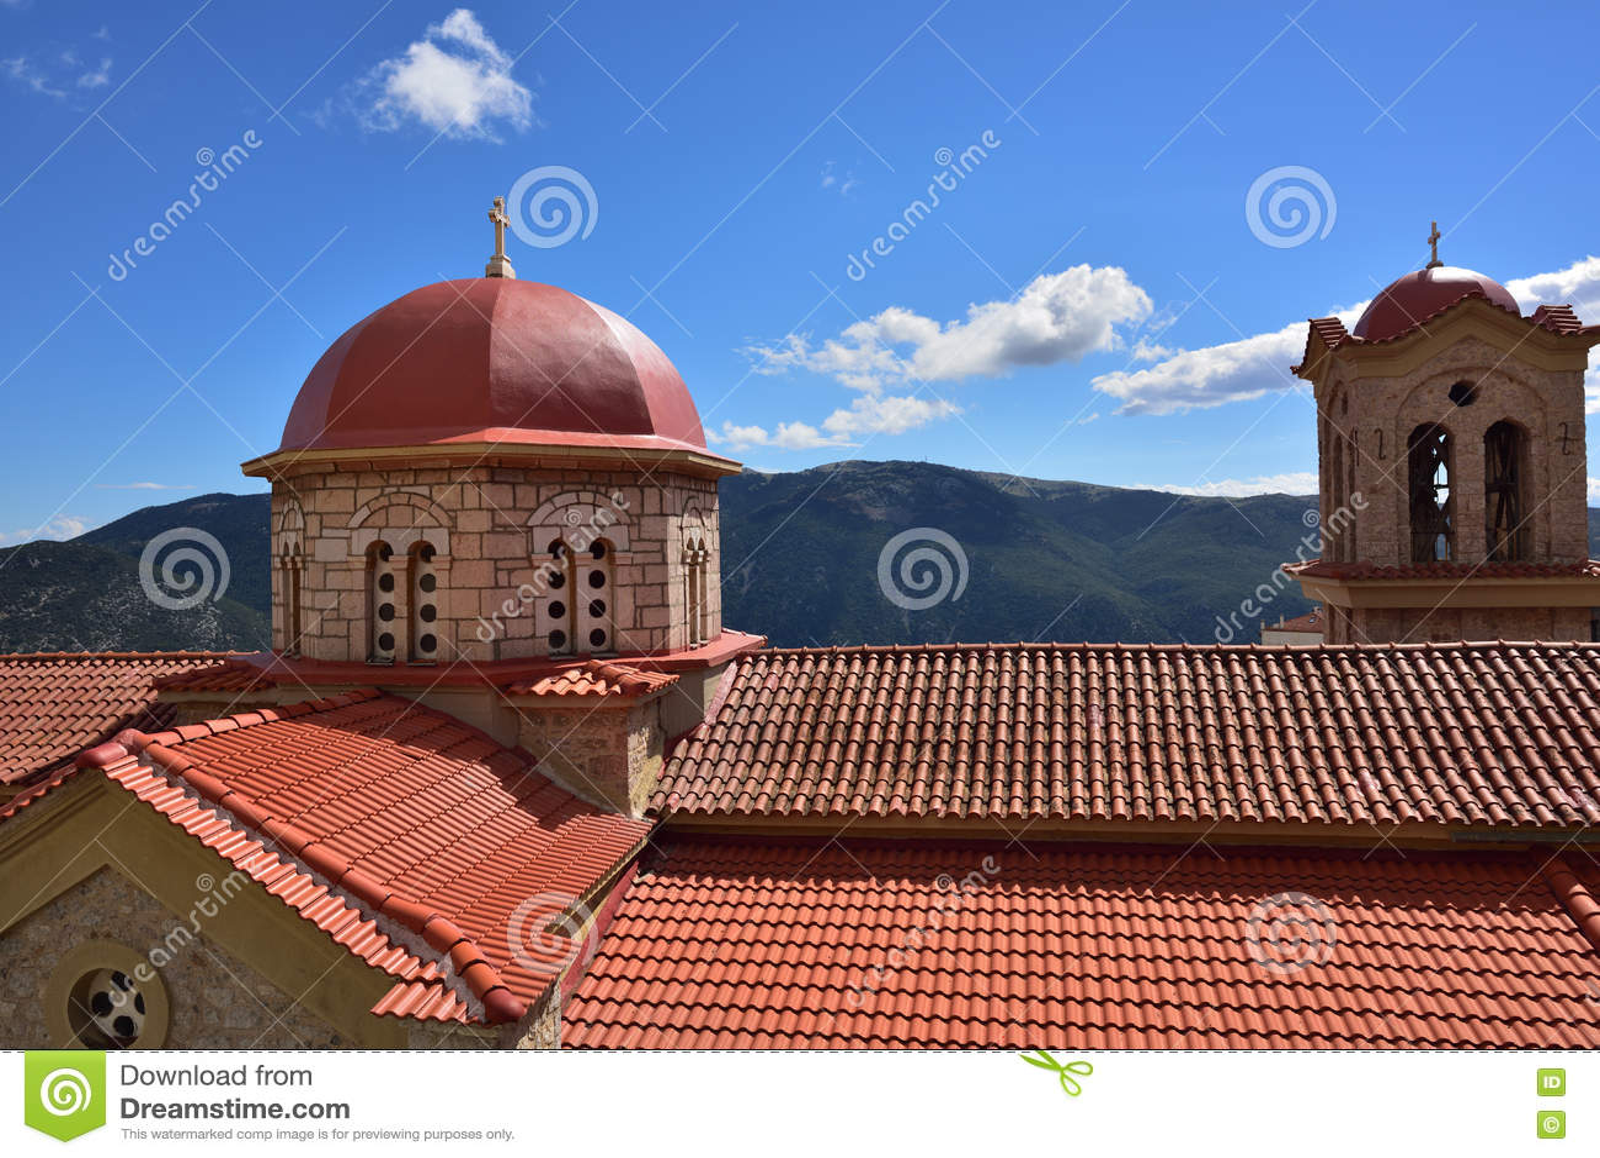 Tejado rojo de la iglesia ortodoxa en Grecia